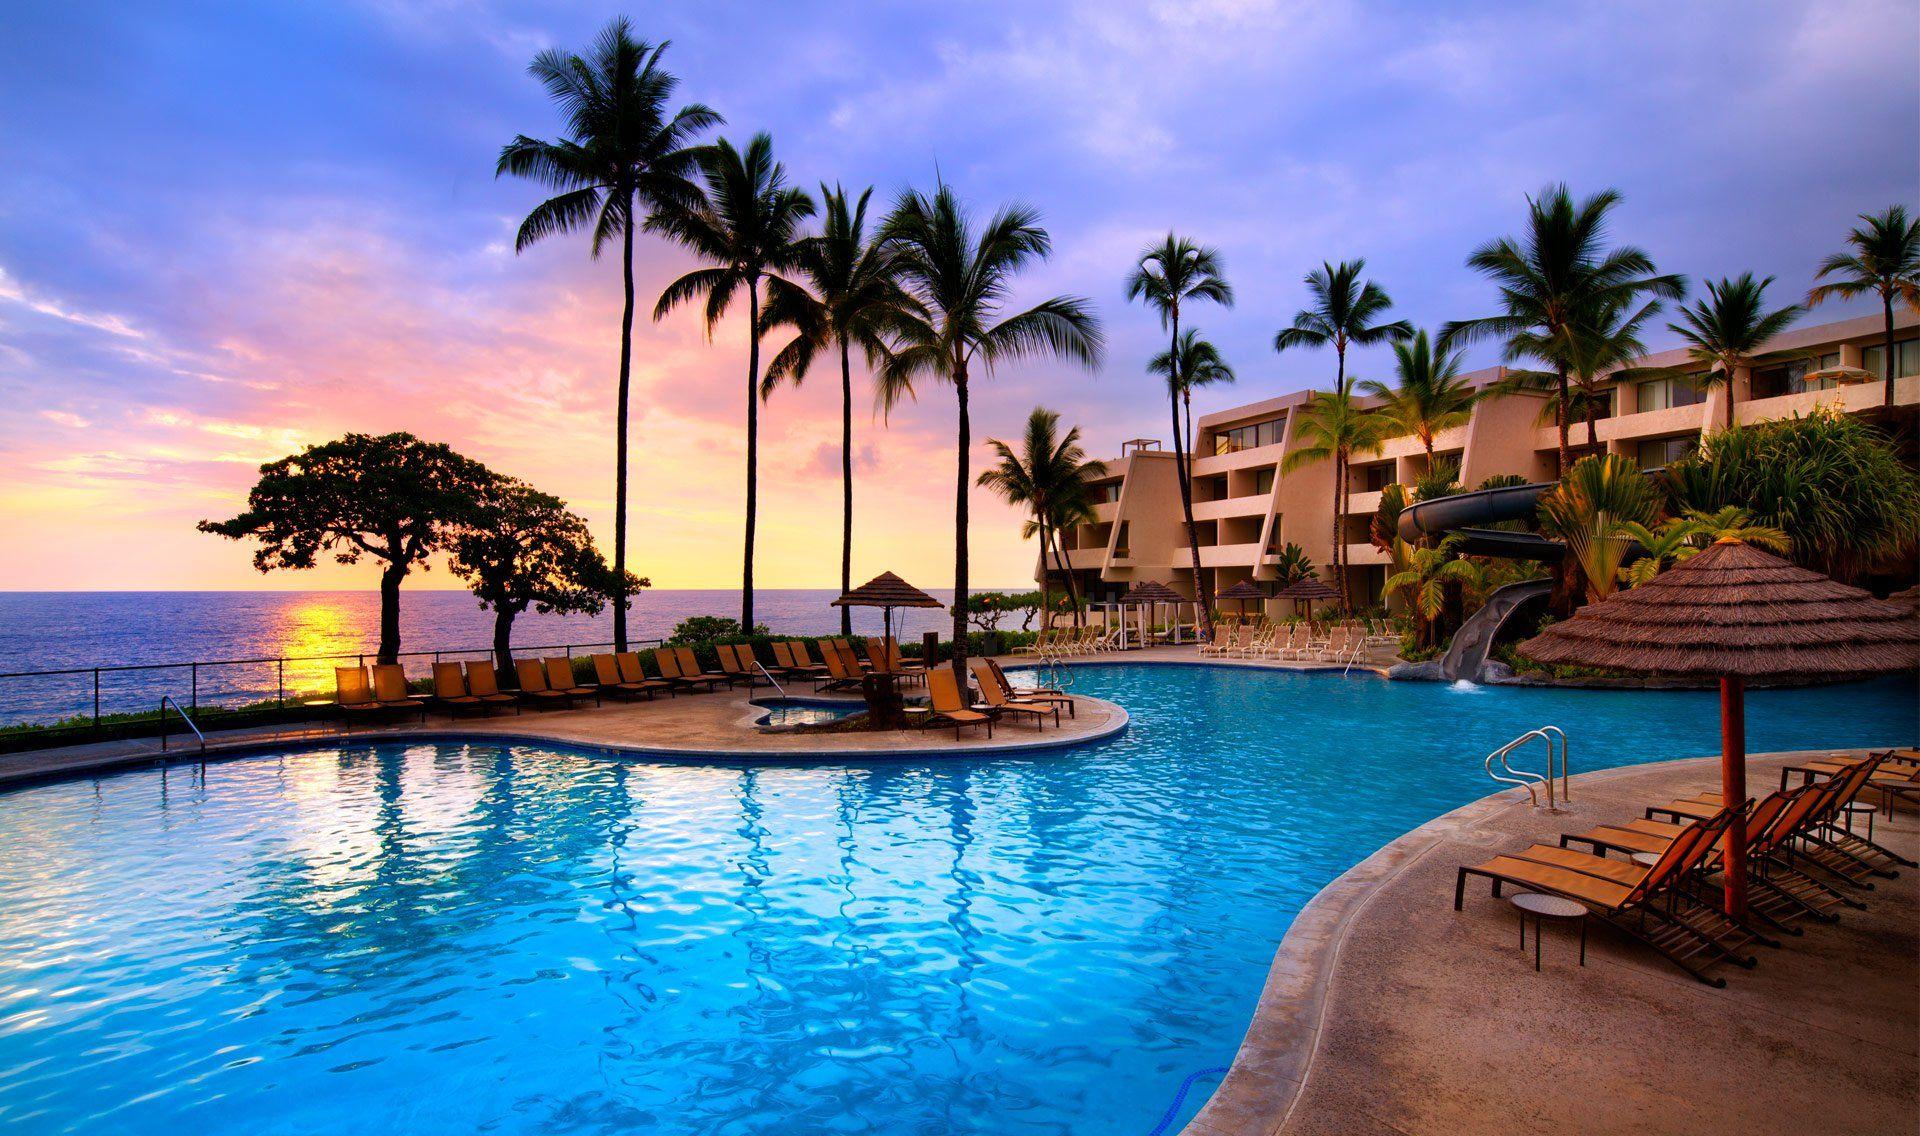 Our Hawaiian Honeymoon At Sheraton Kona Resort Spa Keauhou Bay